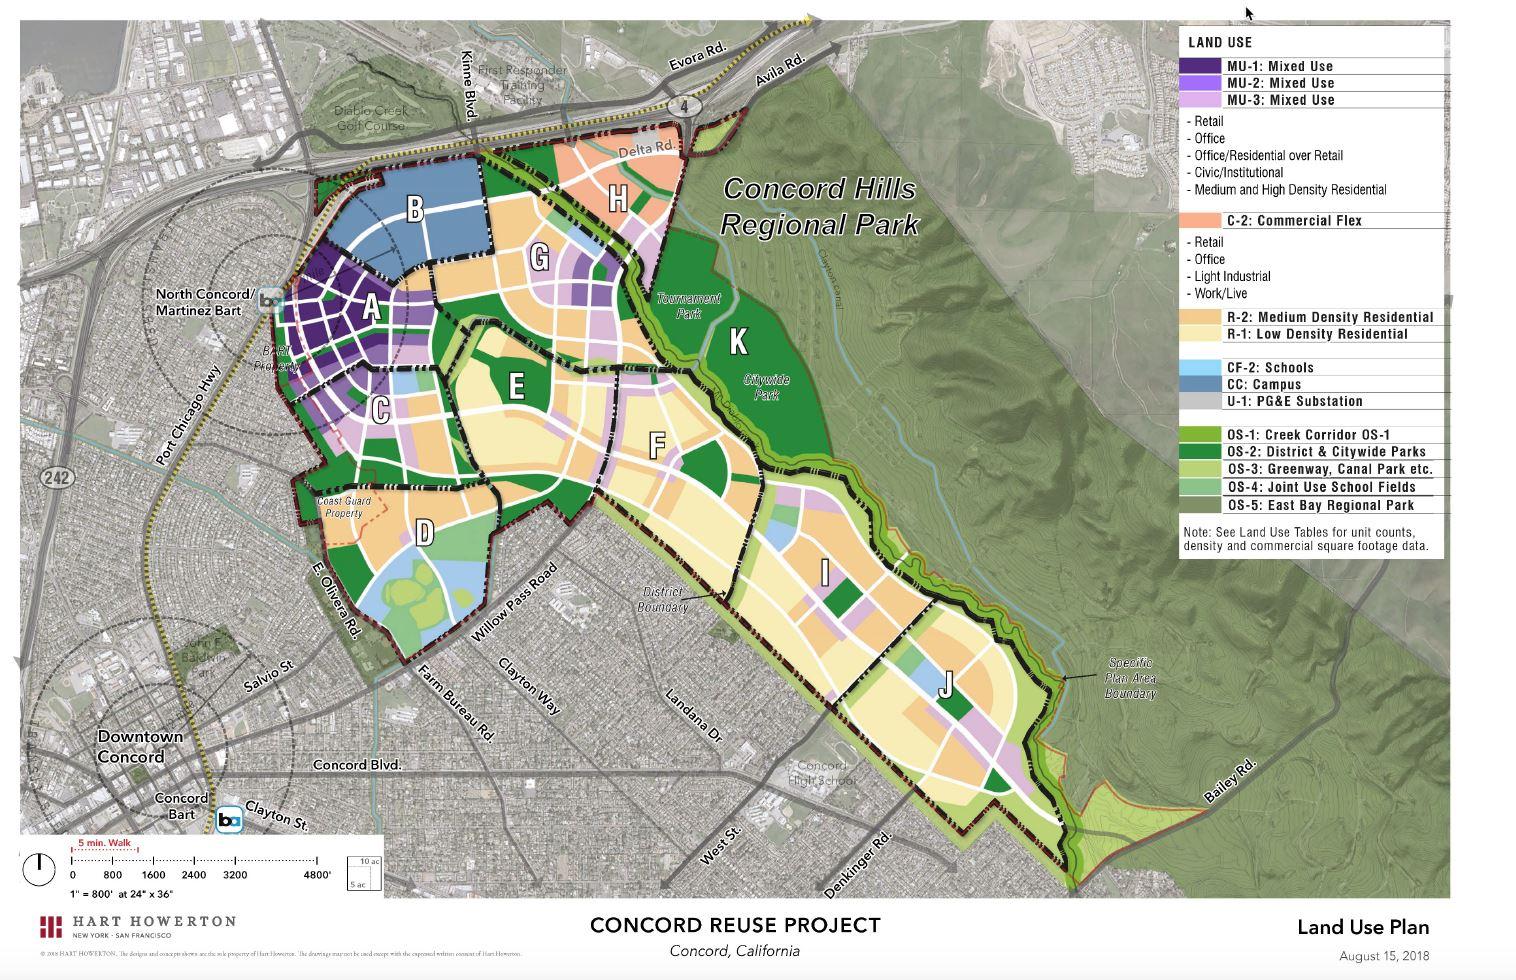 Csueb Concord Campus Map.Campus District Concord Community Reuse Project Ca